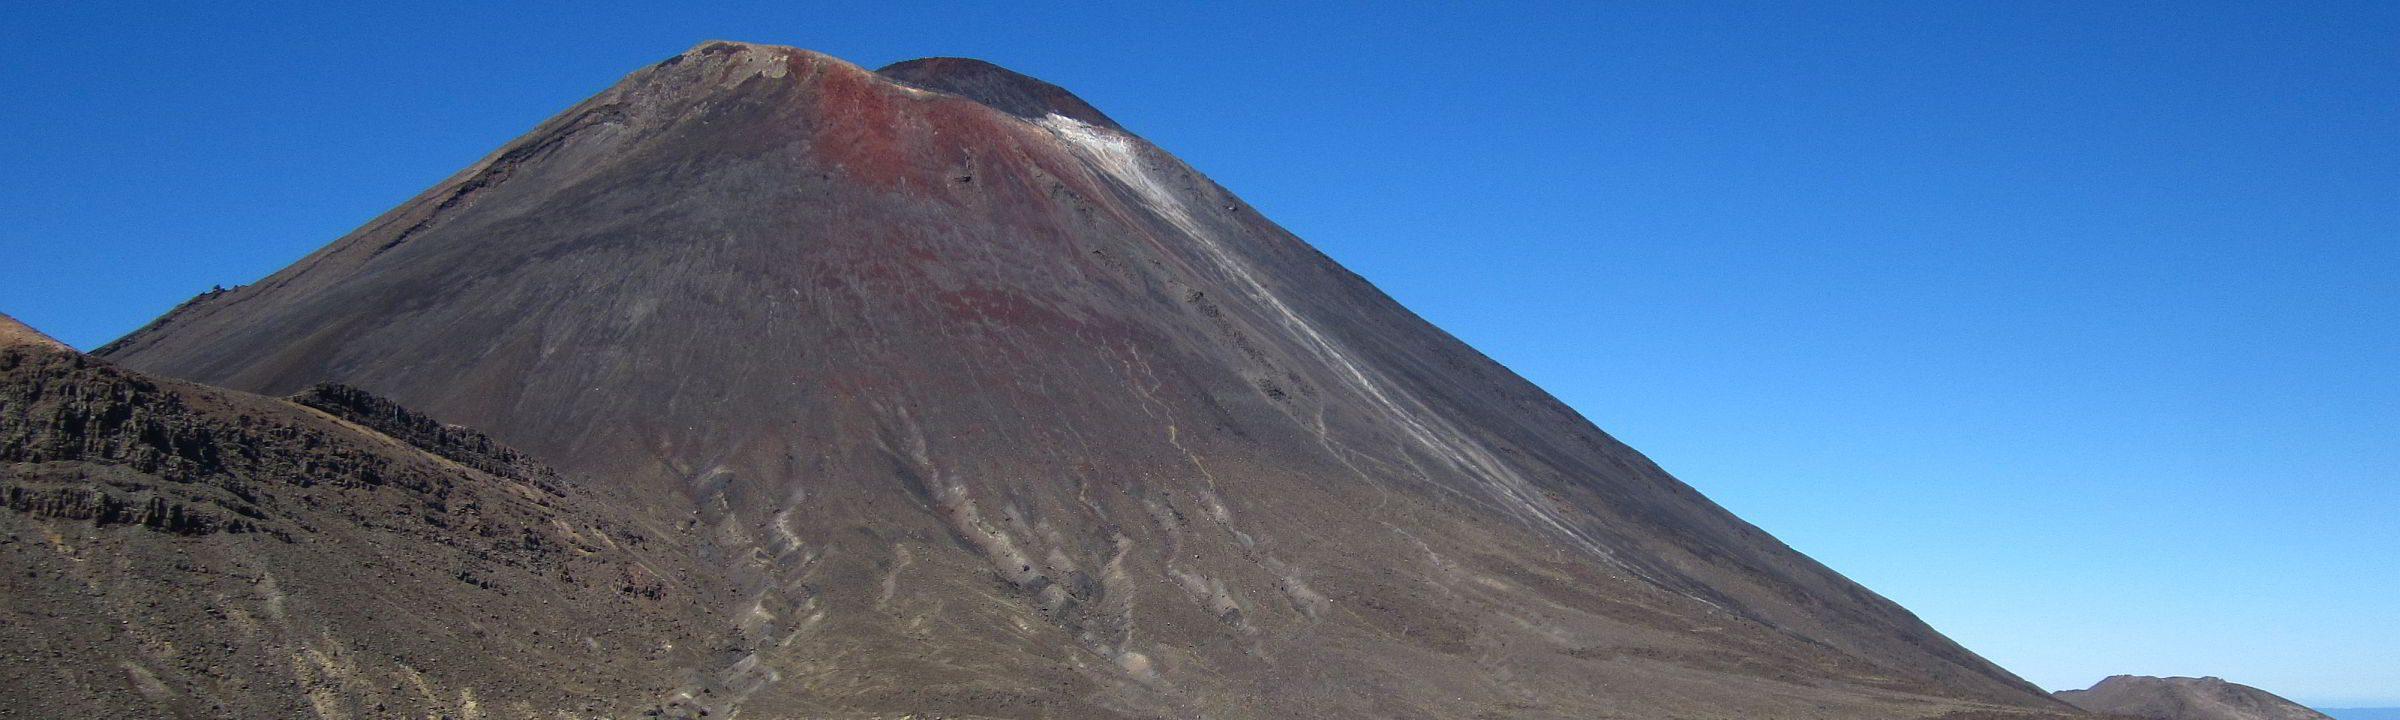 Tongariro Alpine Crossing mit Vulkanlandschaft auf Neuseeland